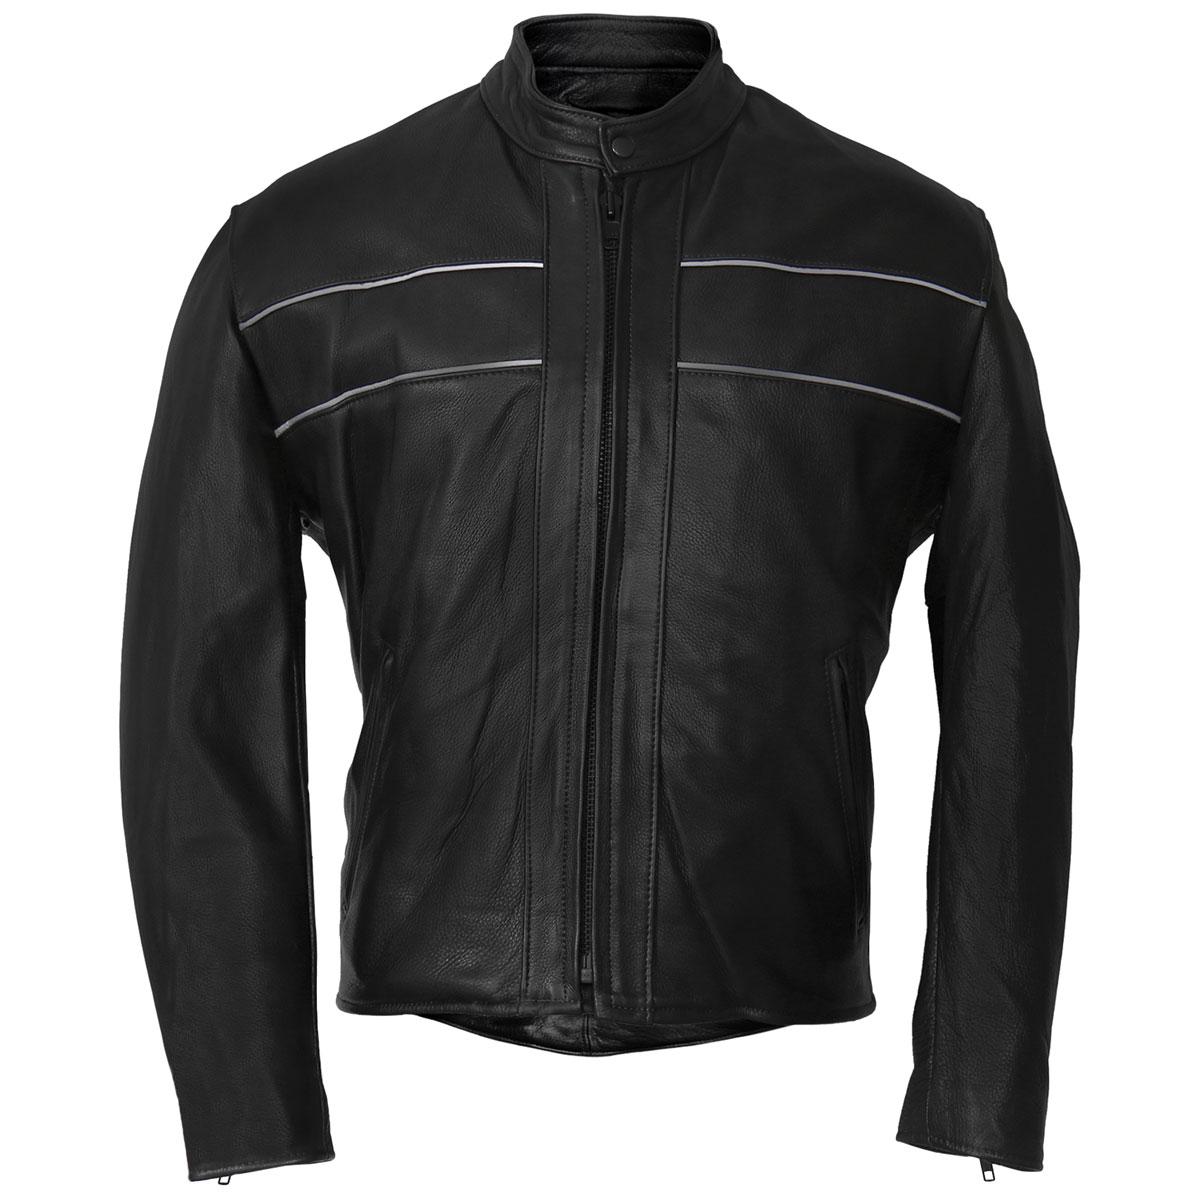 Hot Leathers Men's USA Made Reflective Black Leather Jacket